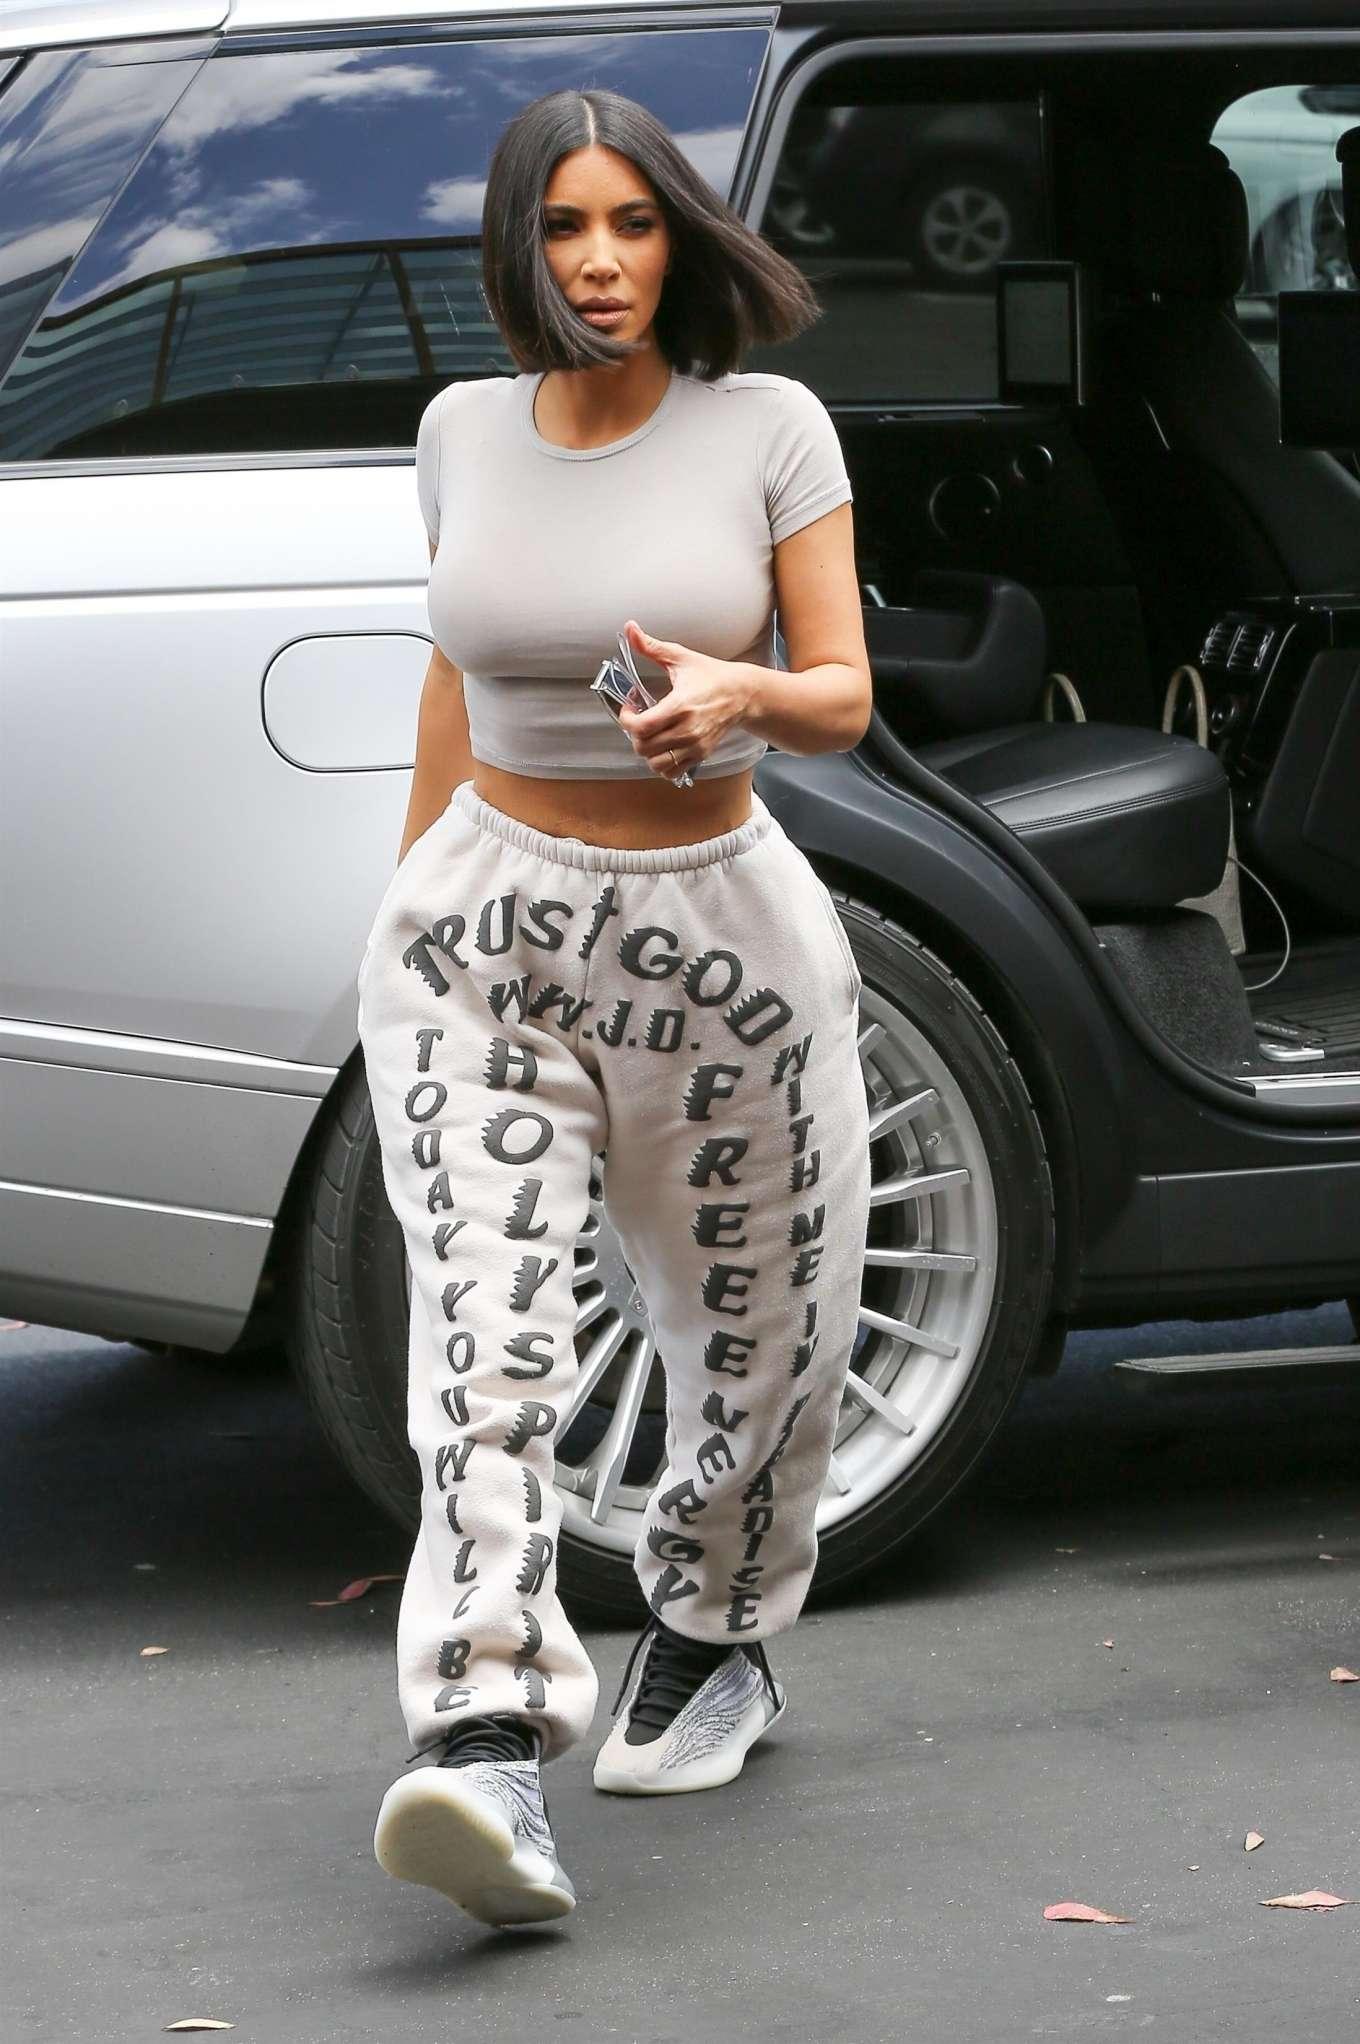 Kim Kardashian wearing Yeezy light grey printed sweatpants with side pockets, elastic belt waist and ribbed hem